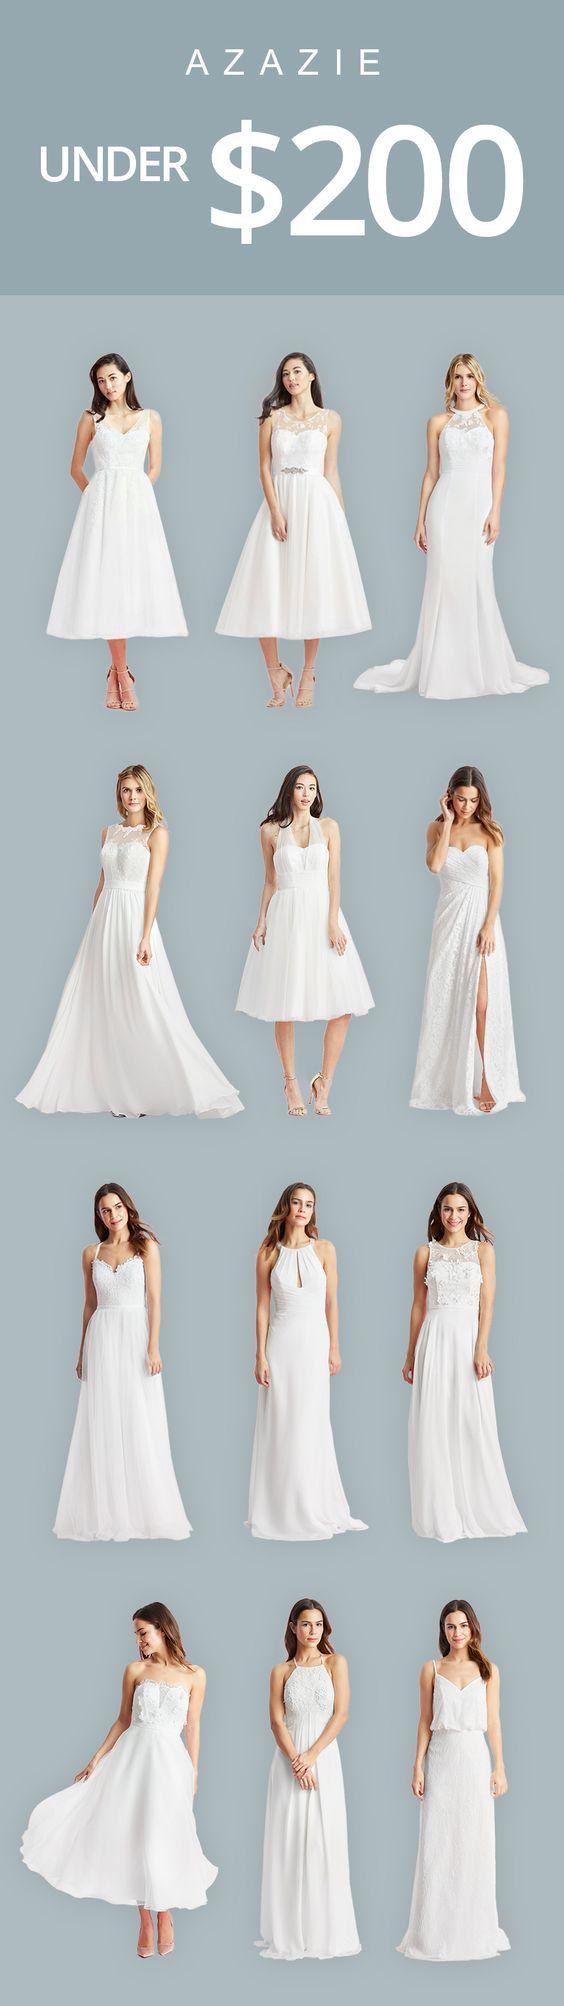 203 best Wedding Gowns & Dresses images on Pinterest | Bridal ...